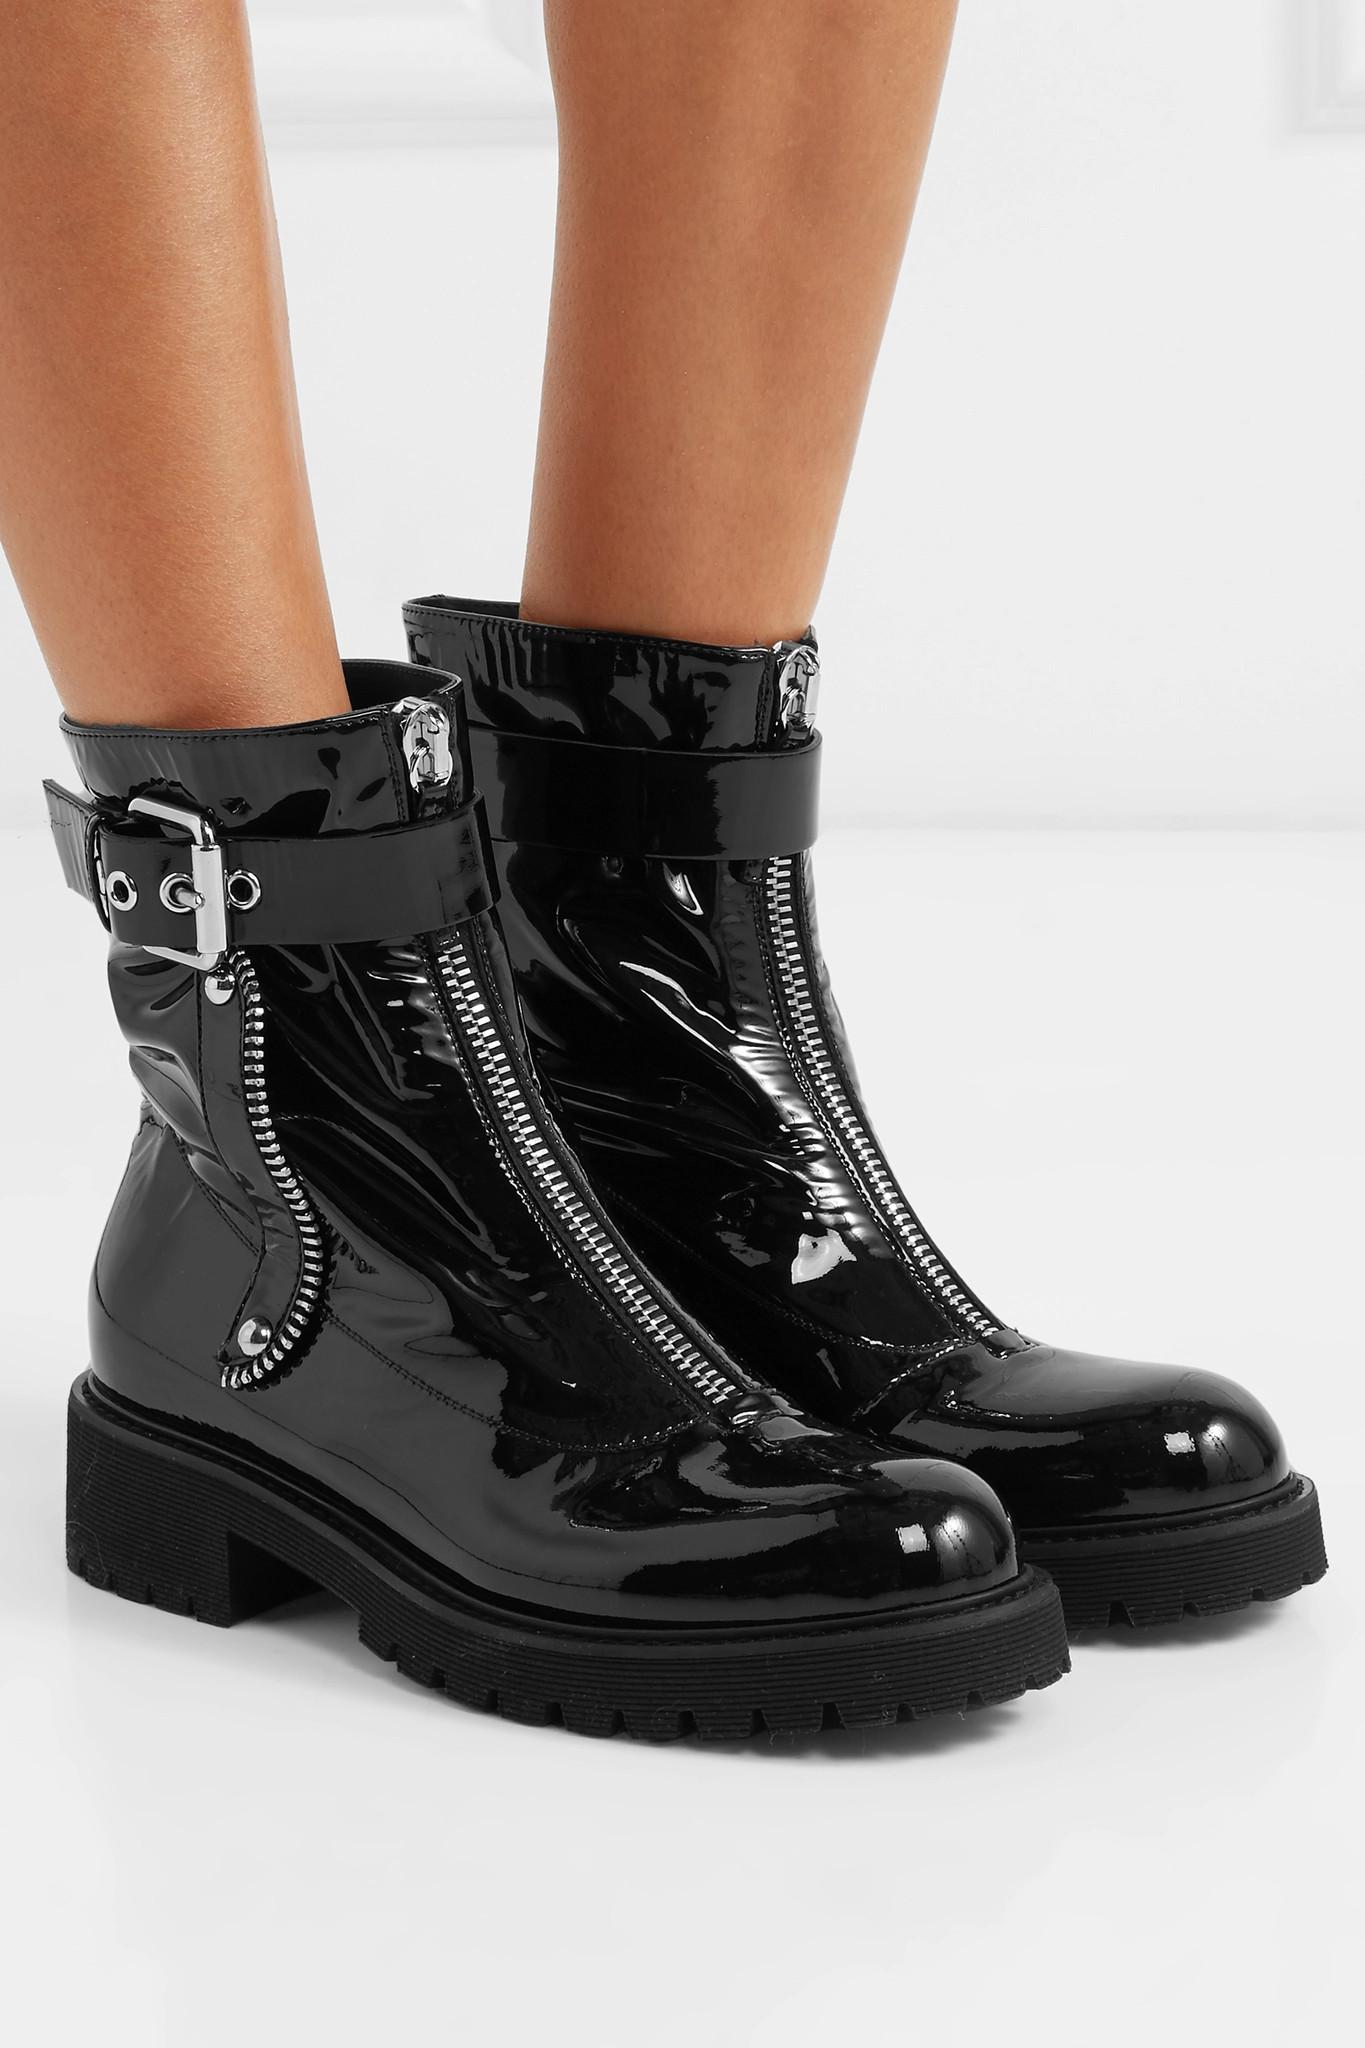 57594d935ff97 Giuseppe Zanotti Patent-leather Combat Boots in Black - Lyst